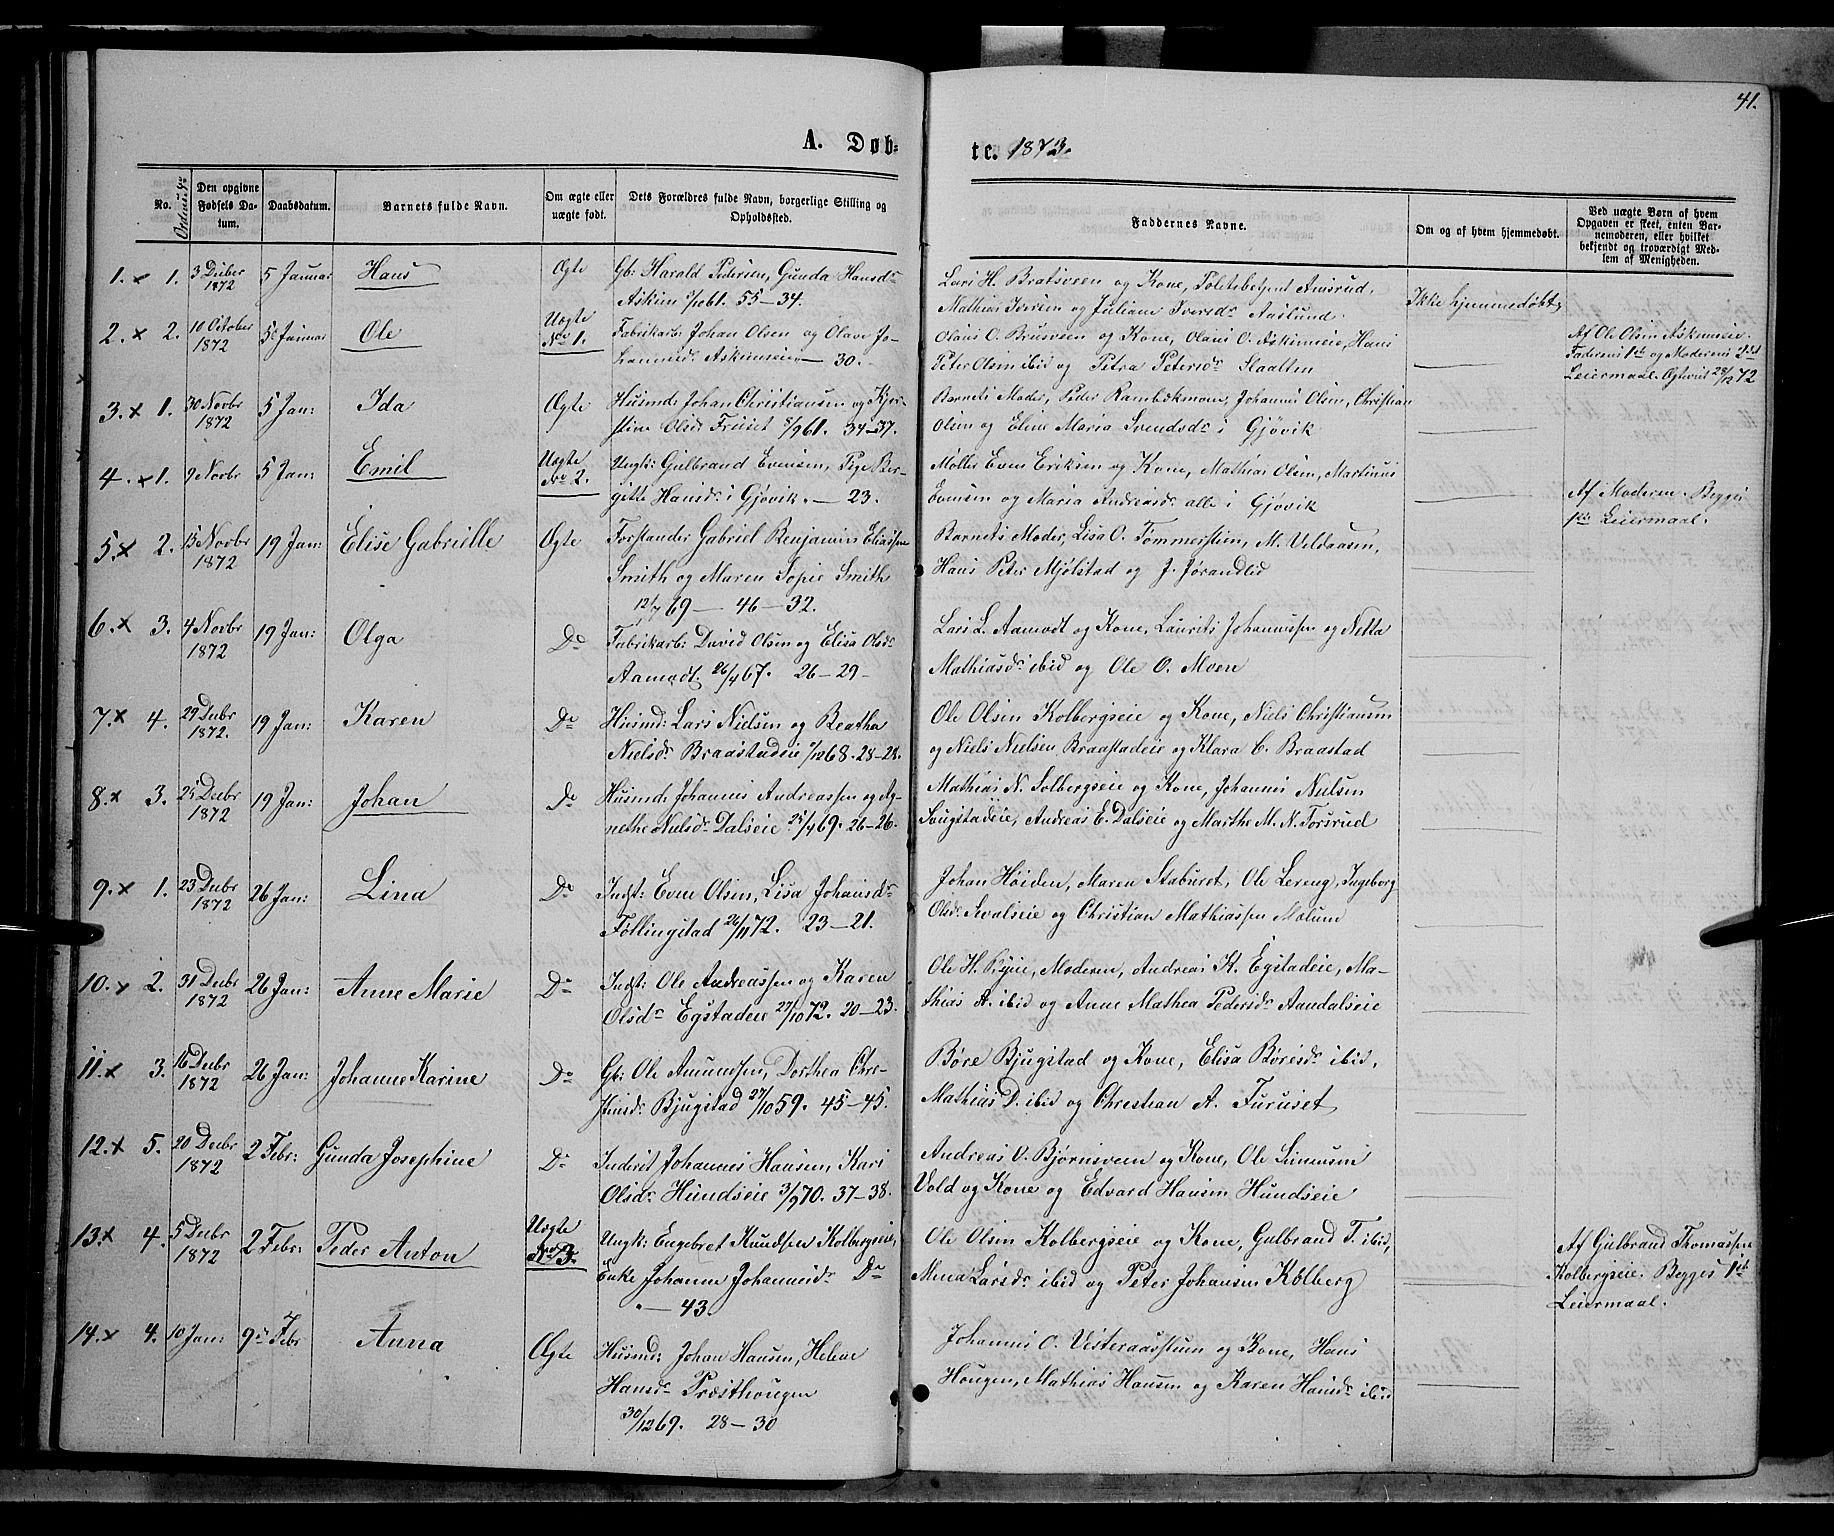 SAH, Vardal prestekontor, H/Ha/Hab/L0006: Klokkerbok nr. 6, 1869-1881, s. 41